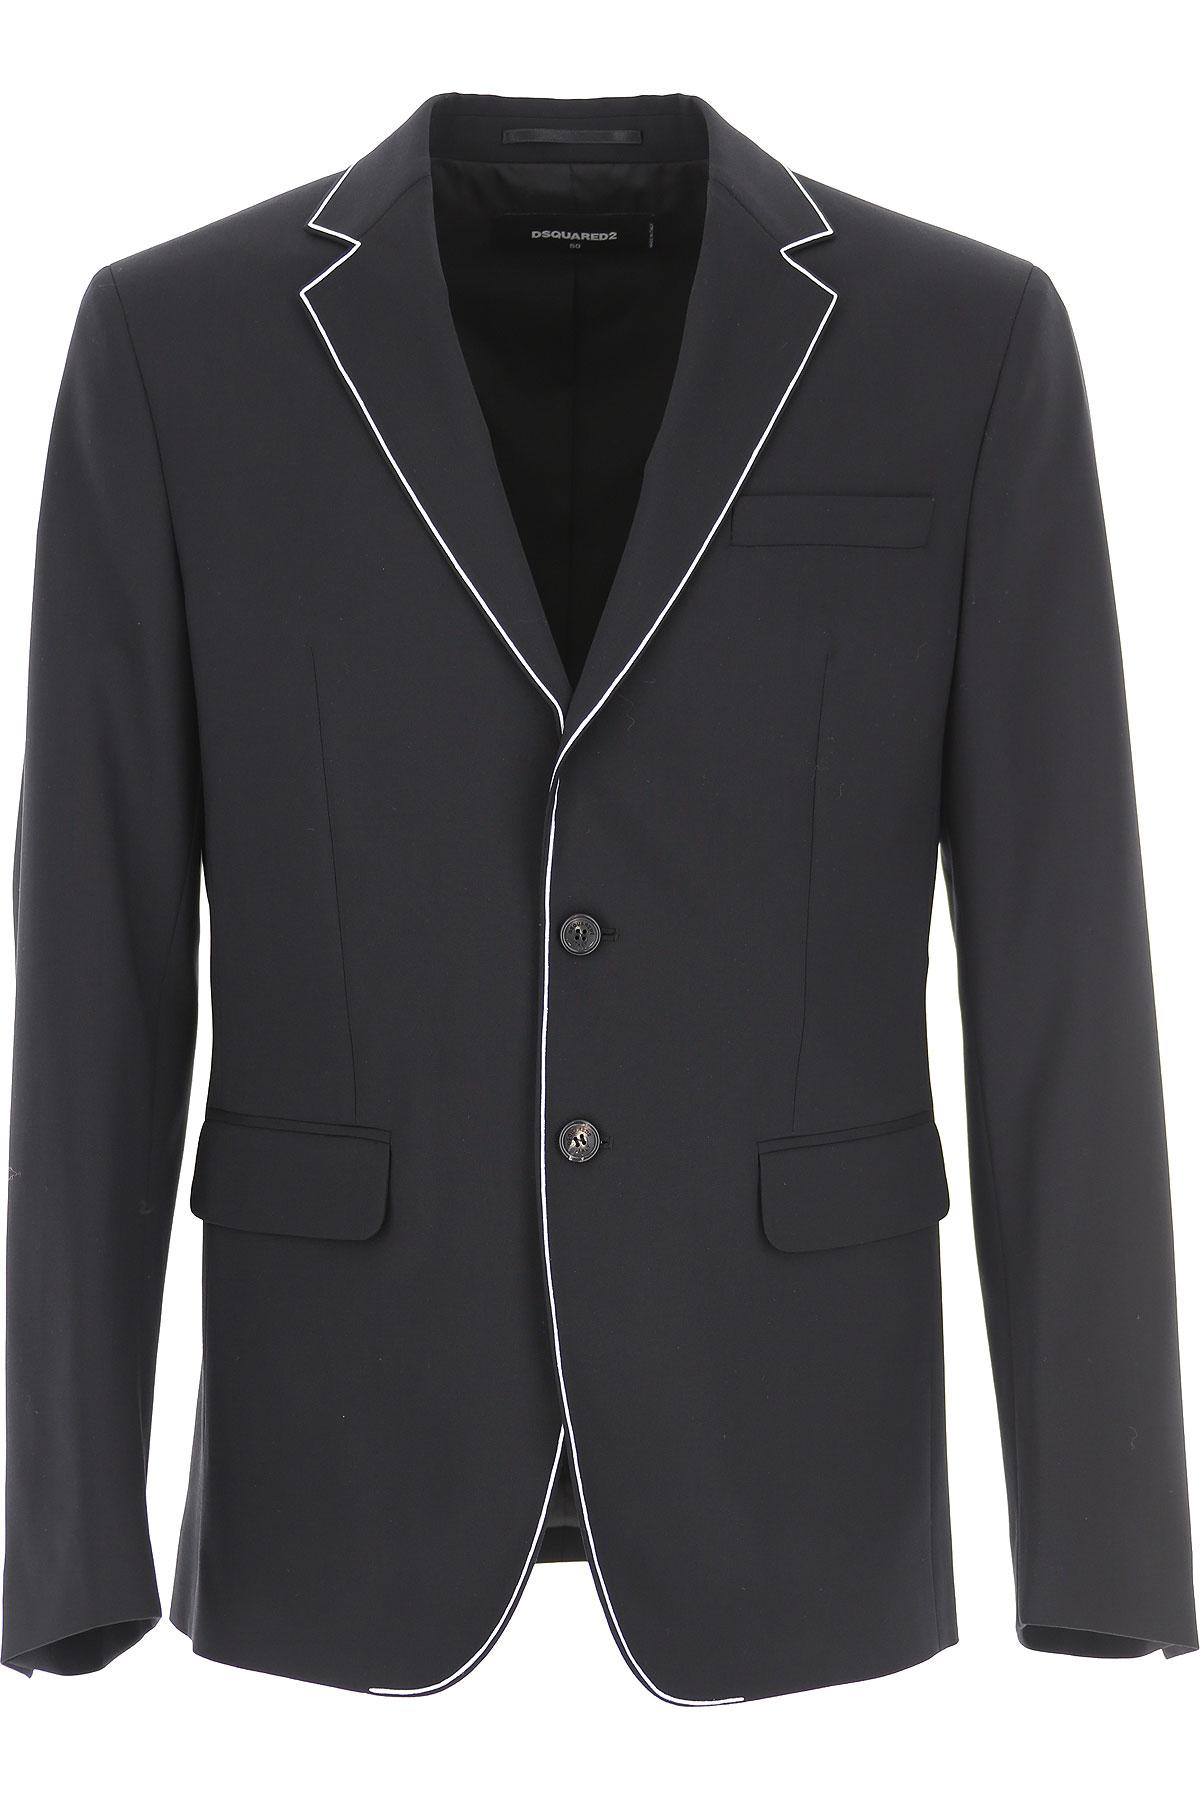 Dsquared2 Blazer for Men, Sport Coat On Sale, Black, Wool, 2019, L XL